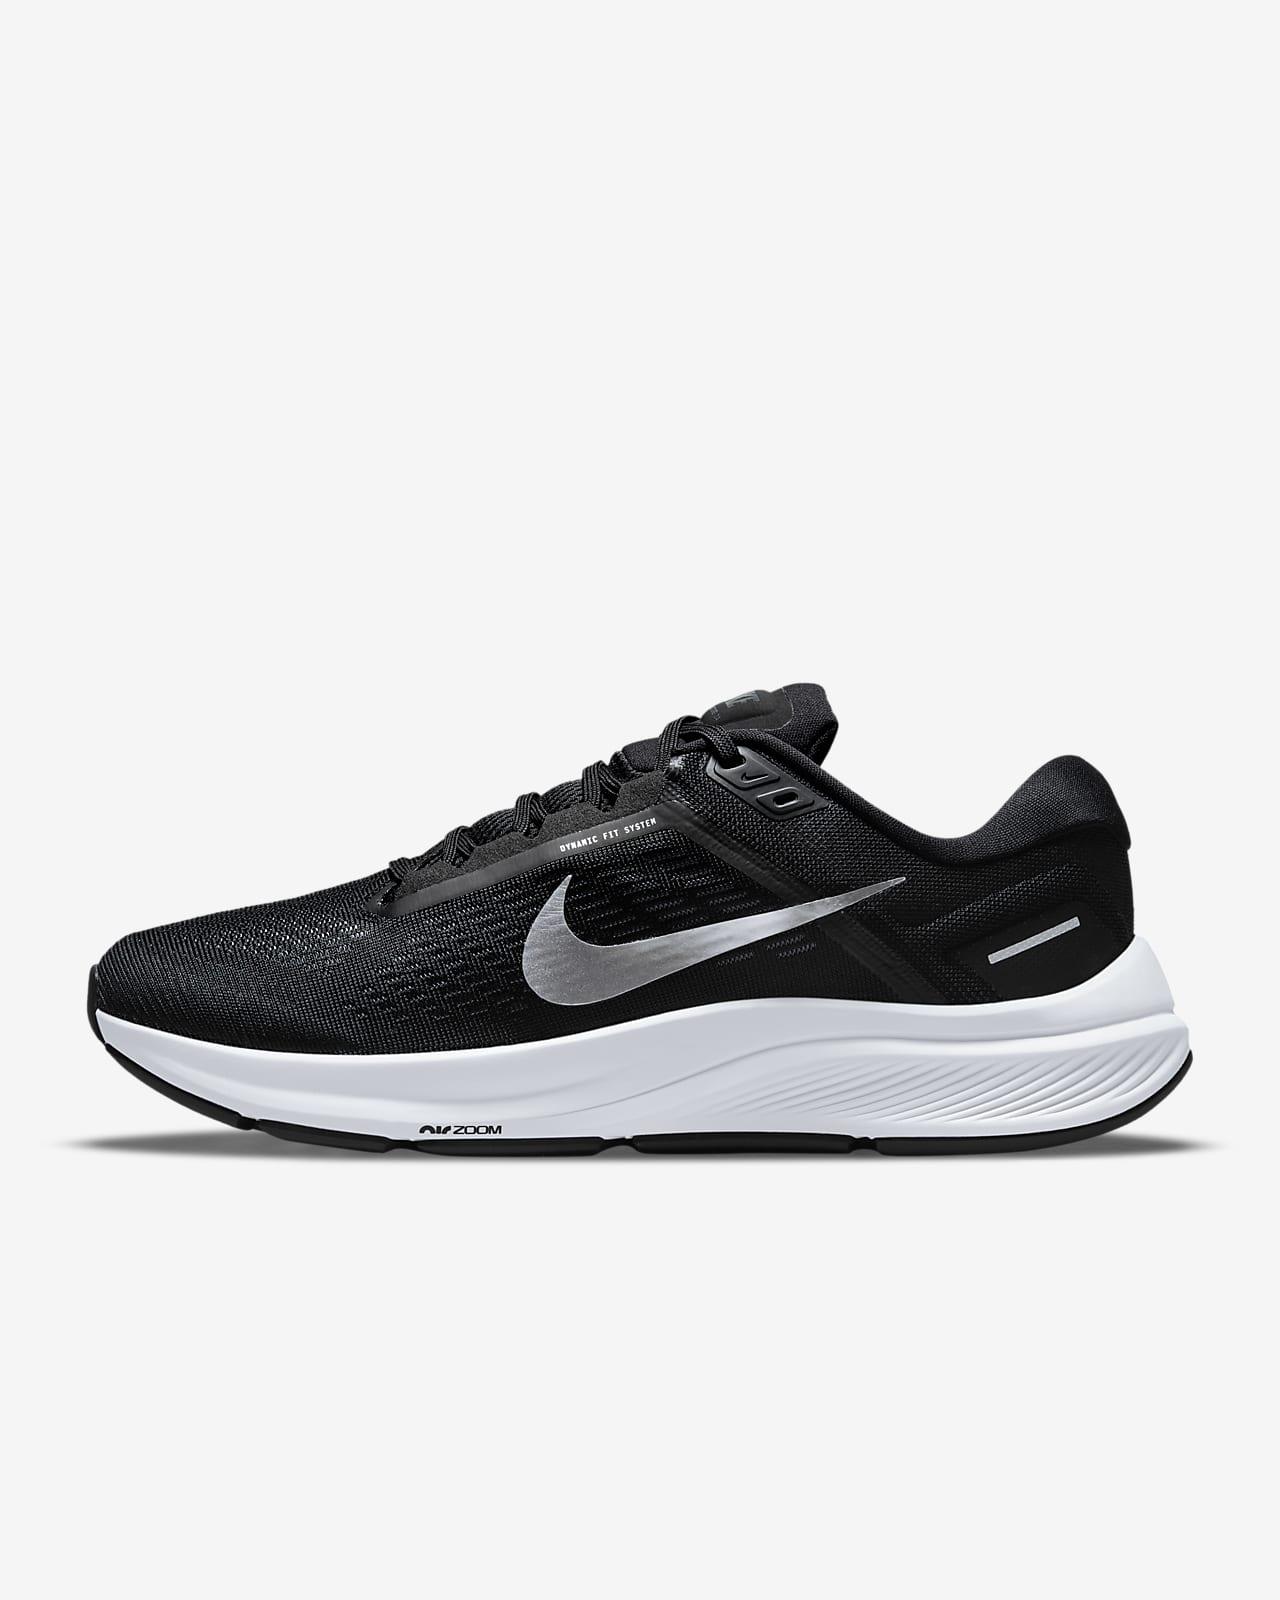 Chaussure de running sur route Nike Air Zoom Structure24 pour Homme